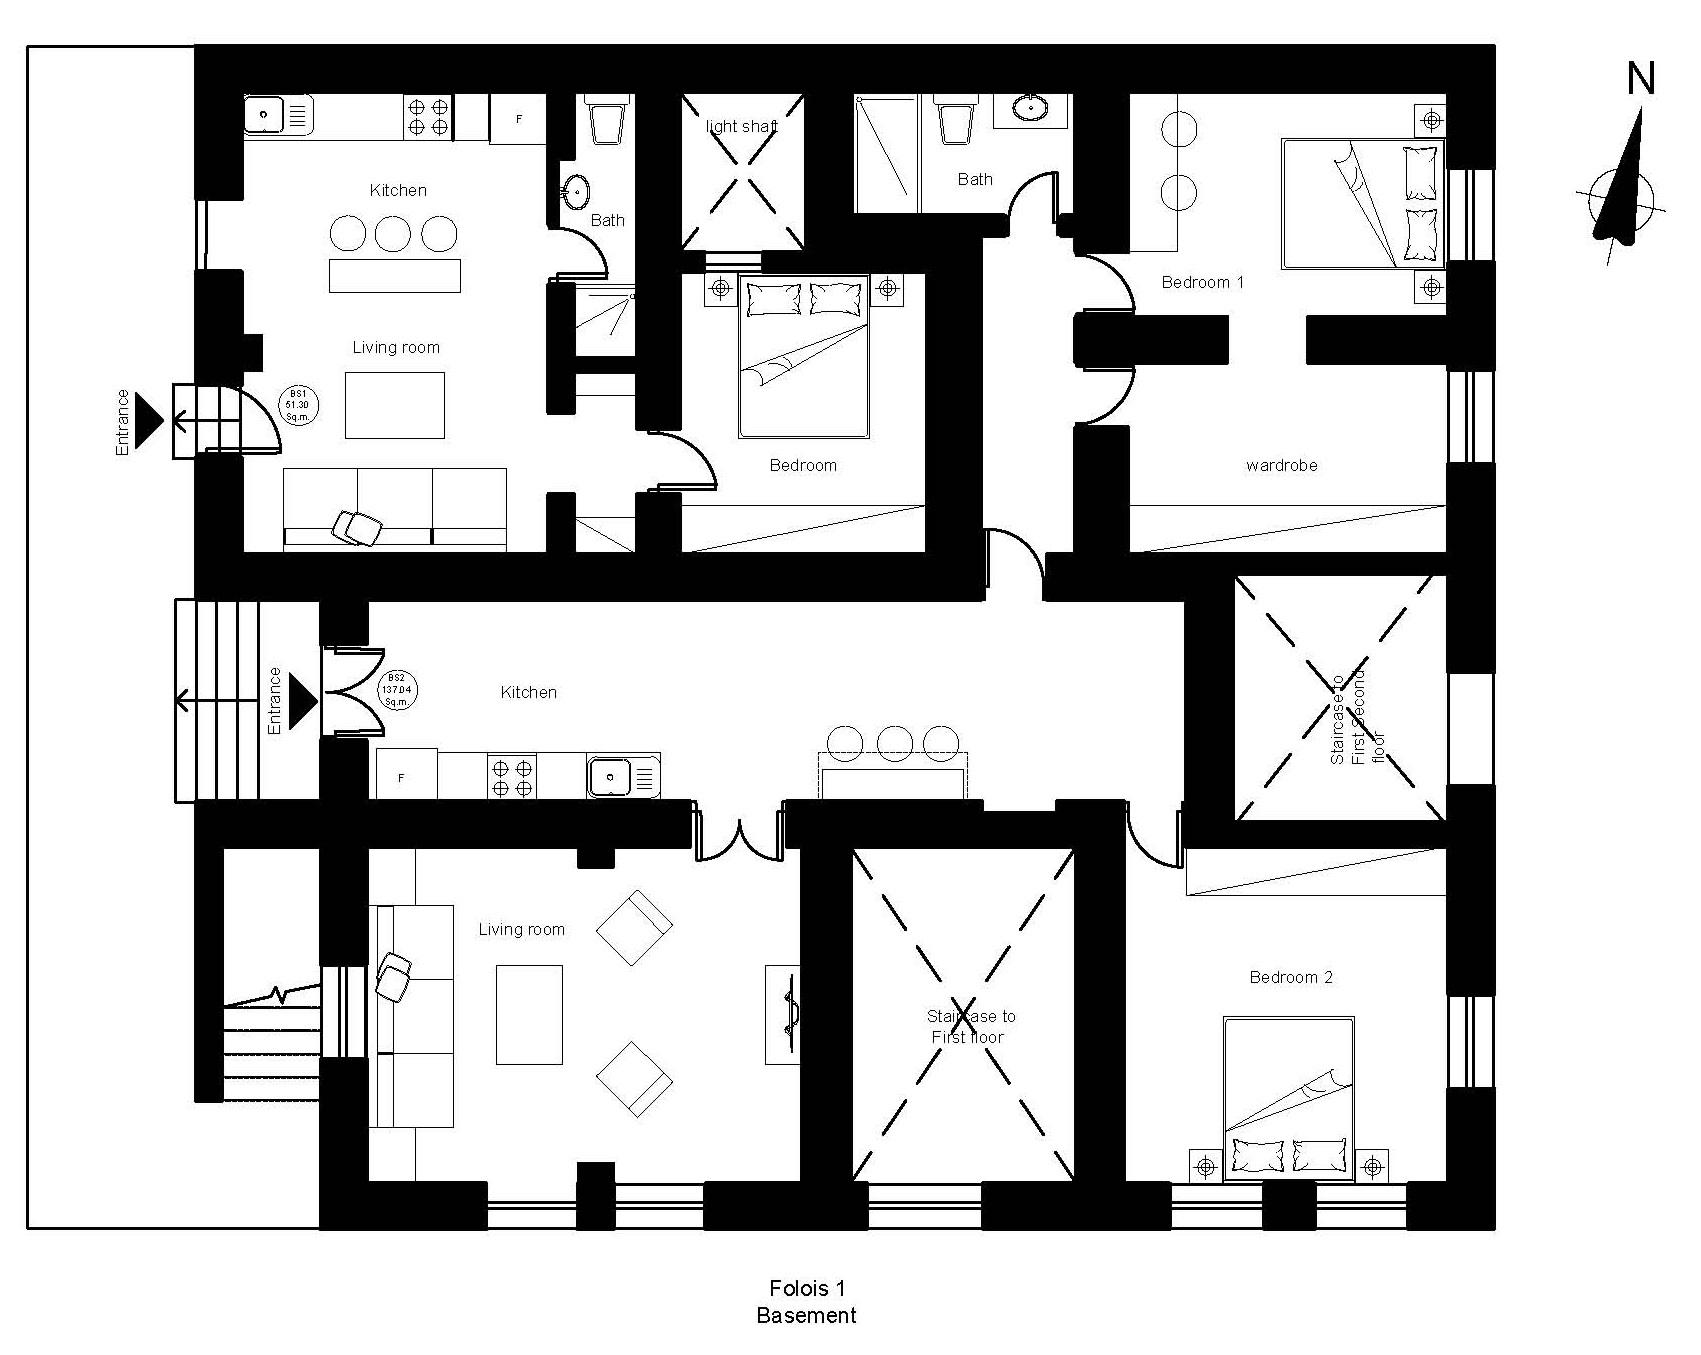 Folois 1 basement plan